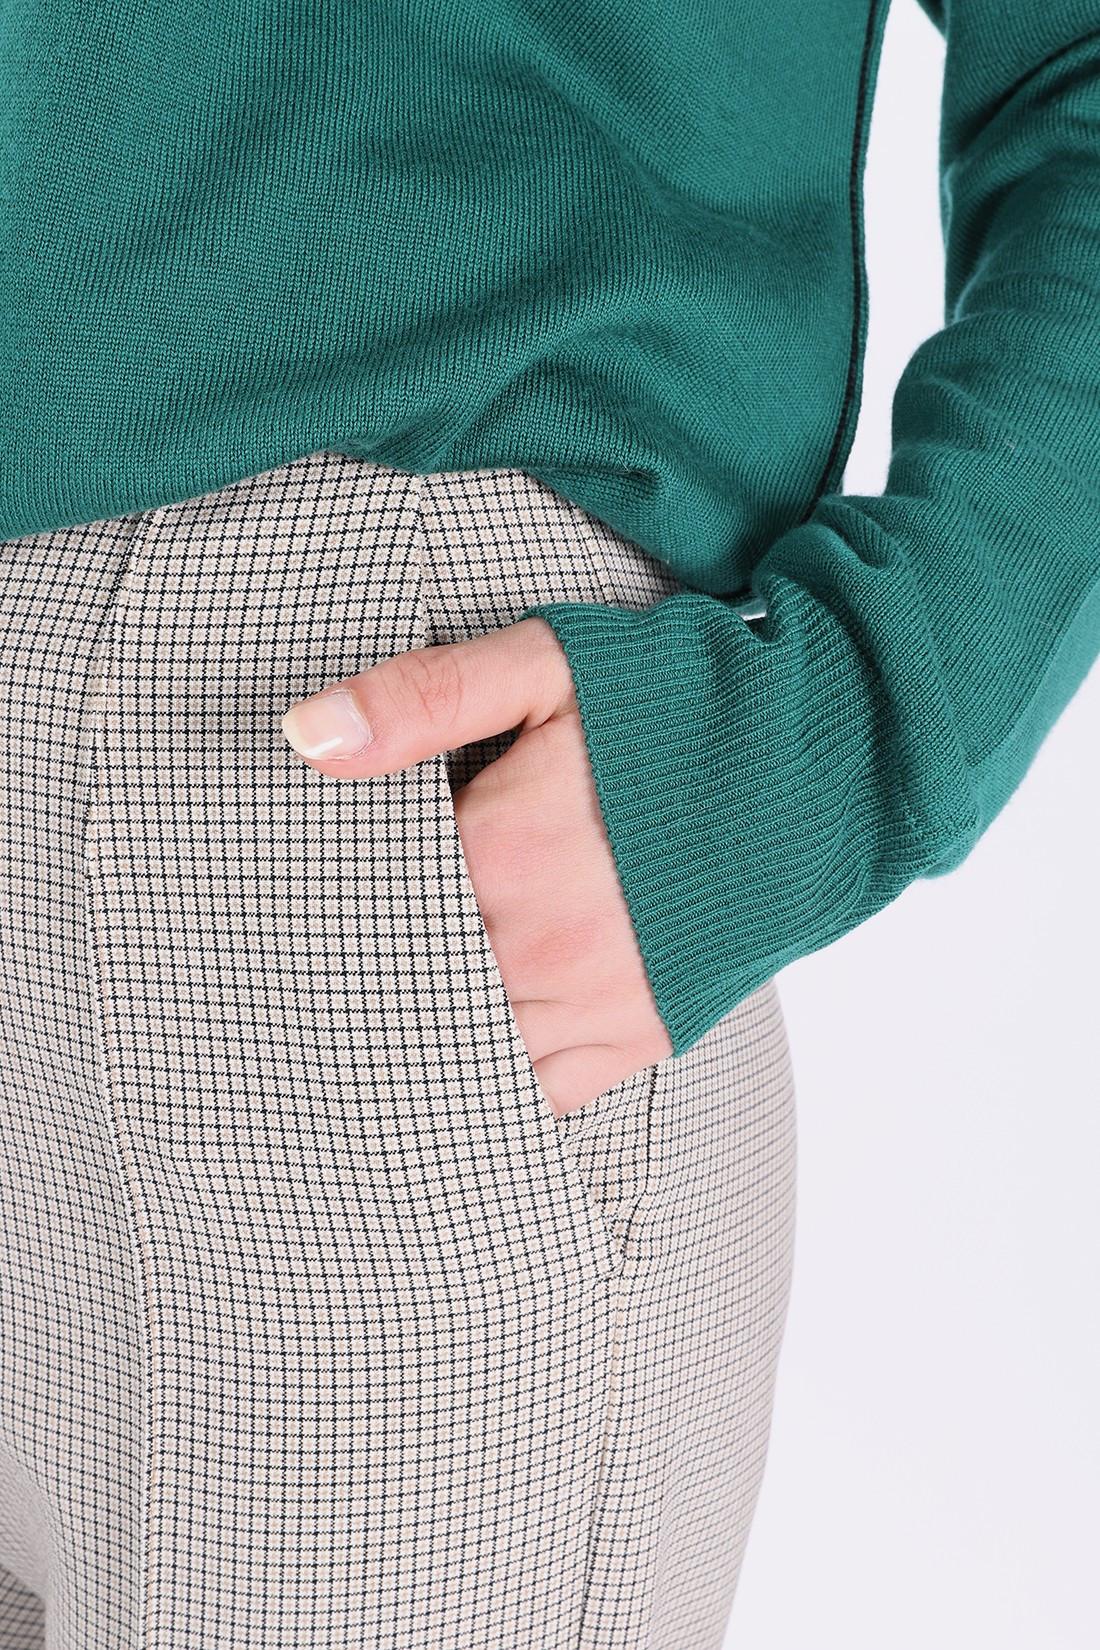 MM6 MAISON MARGIELA FOR WOMAN / S52ka0167 formal trouser Micro check